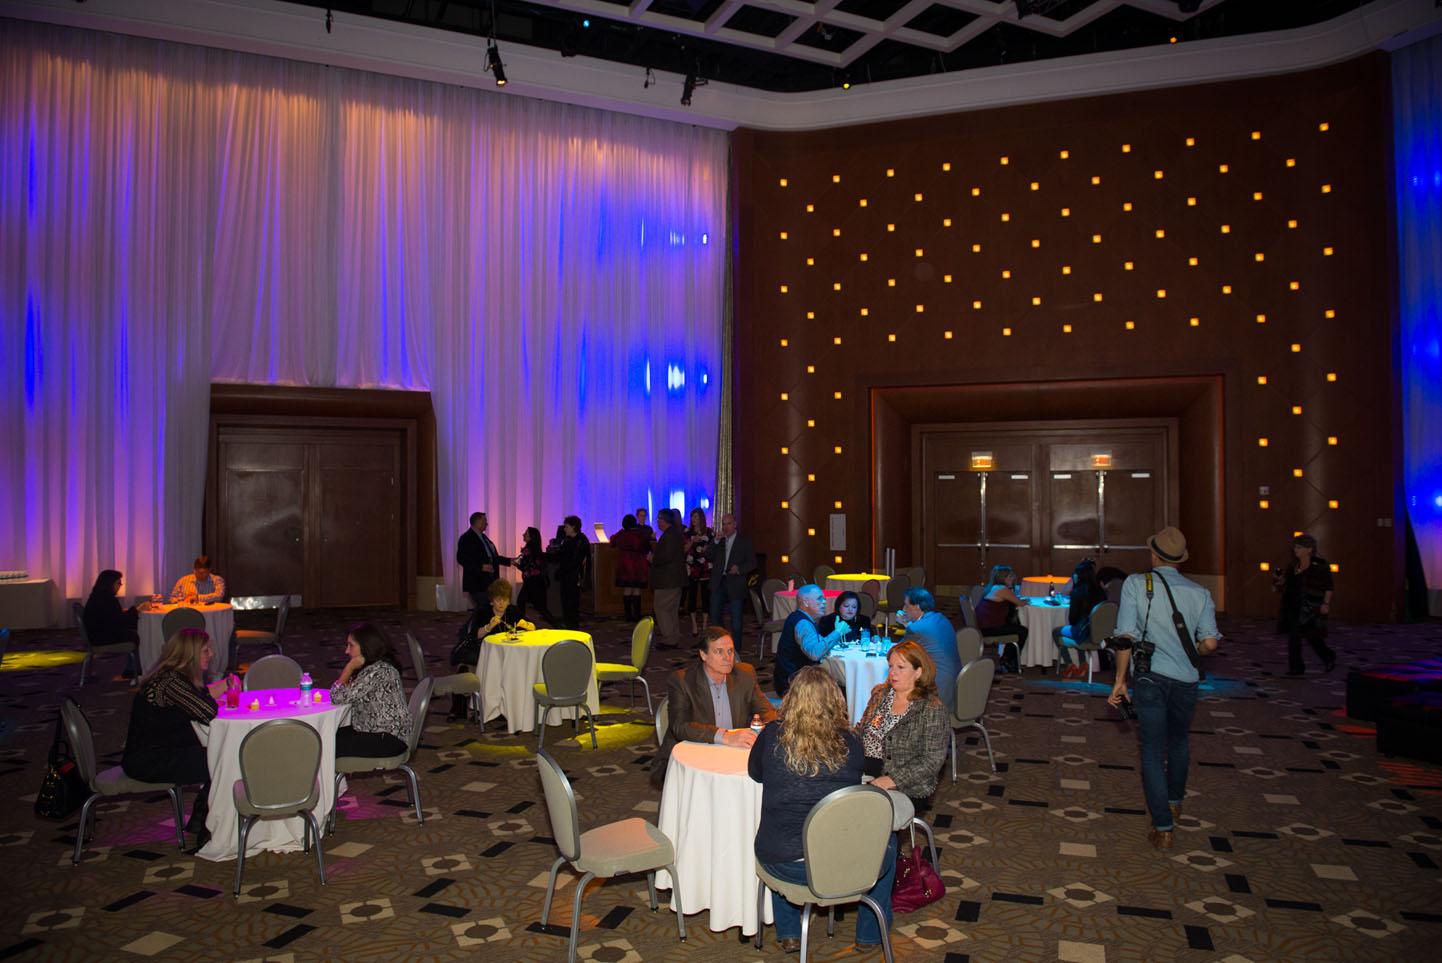 2015-12-09 ReMax Corpoarte Event - The Borgata - Atlantic City NJ - Photo Sesh - 2015-5049.jpg